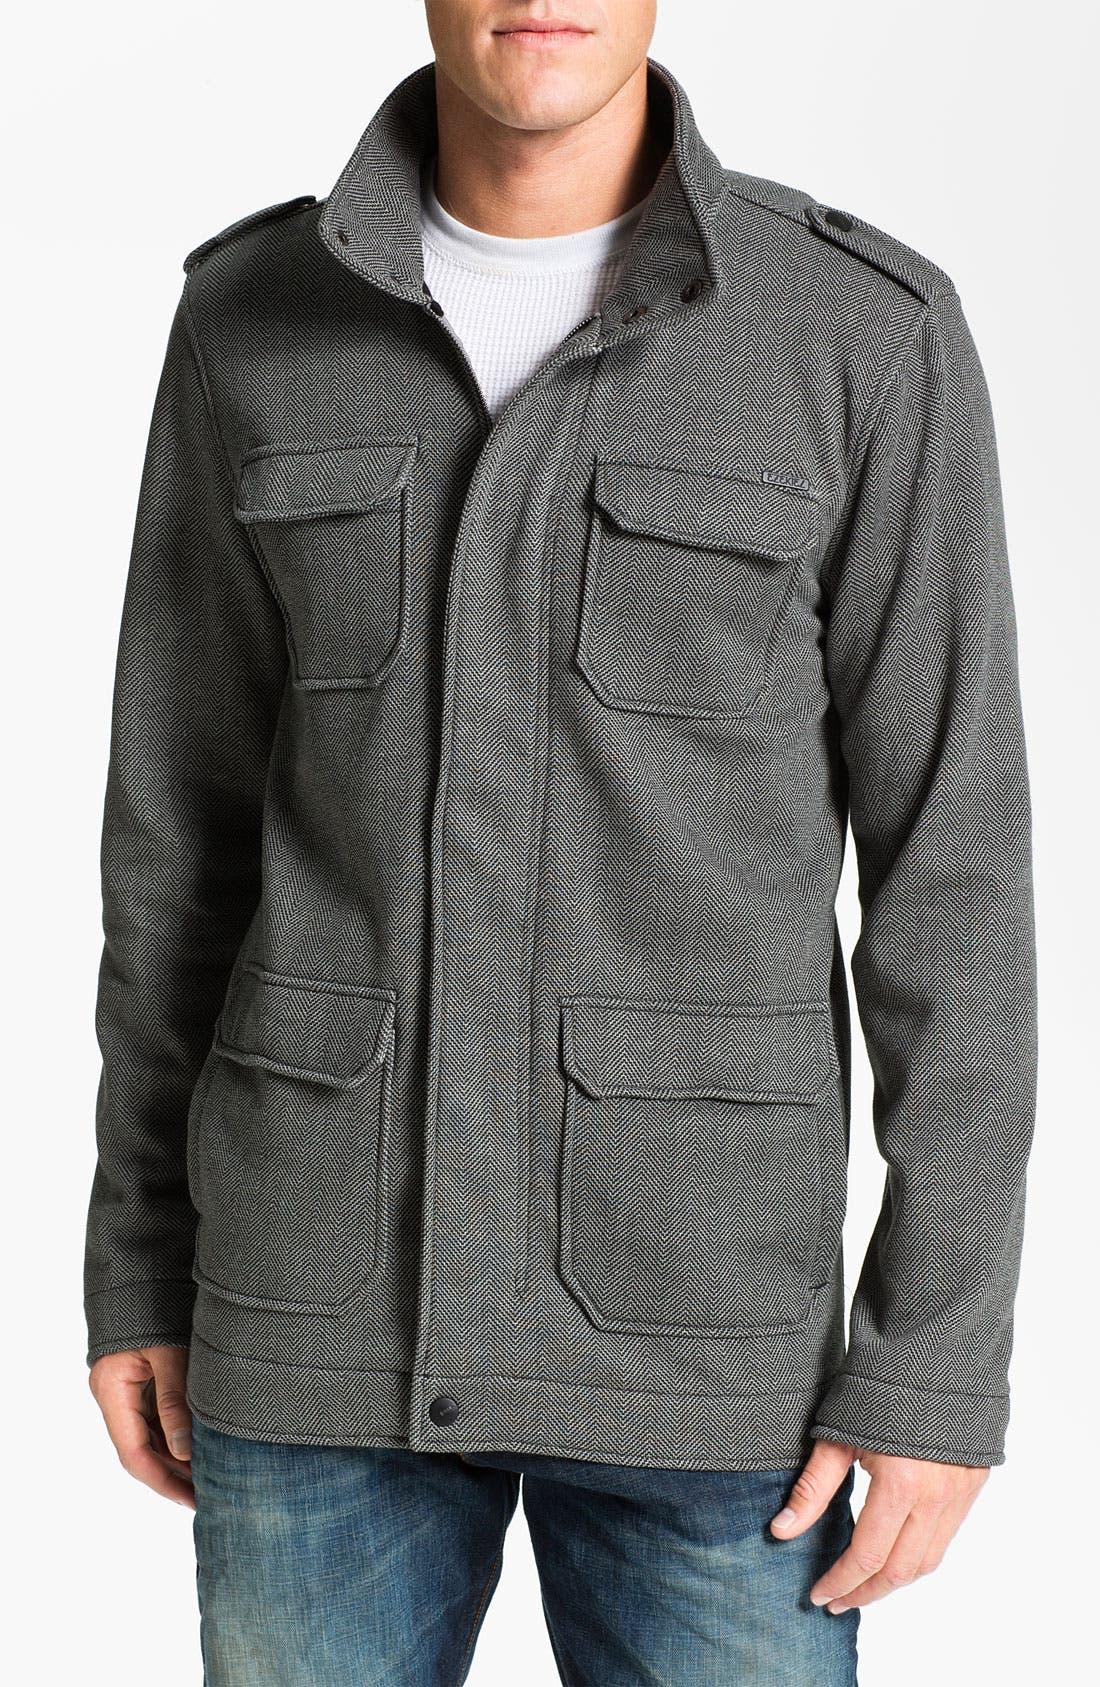 Main Image - Ezekiel 'Cavalier' Jacket